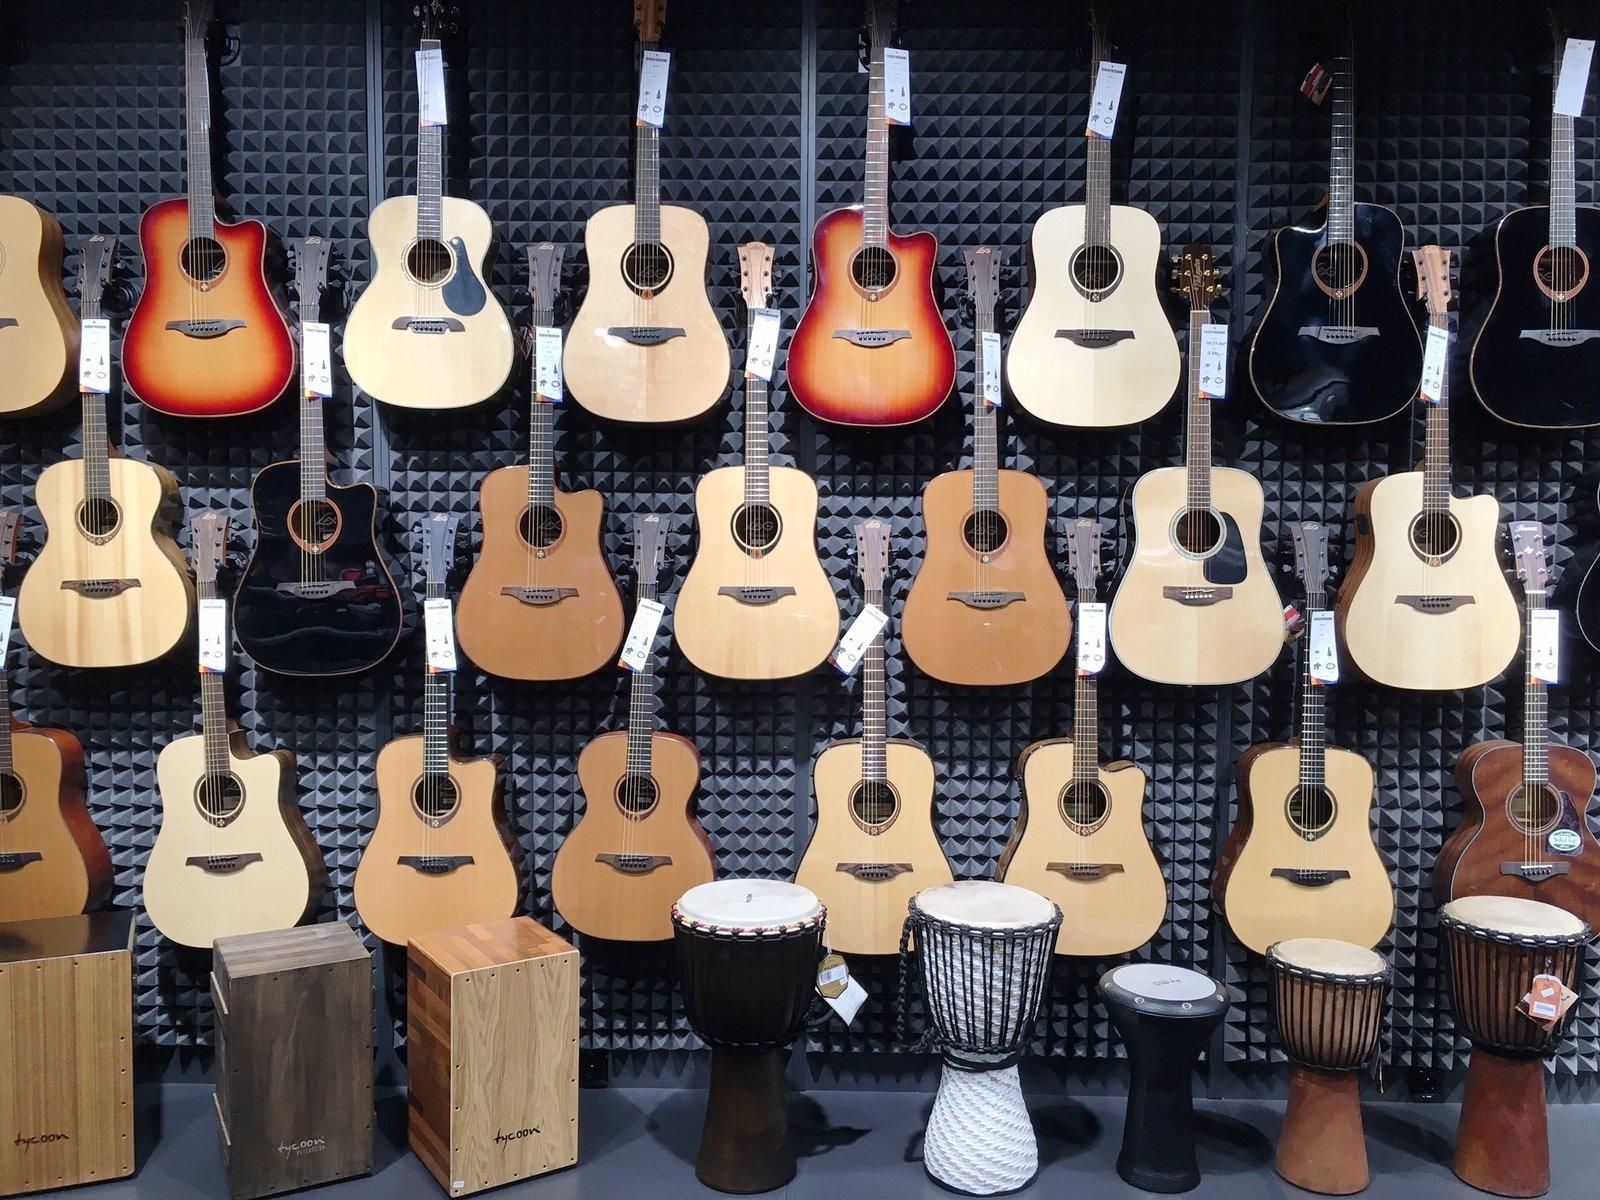 Musical Instruments Praha - Centrum Chodov